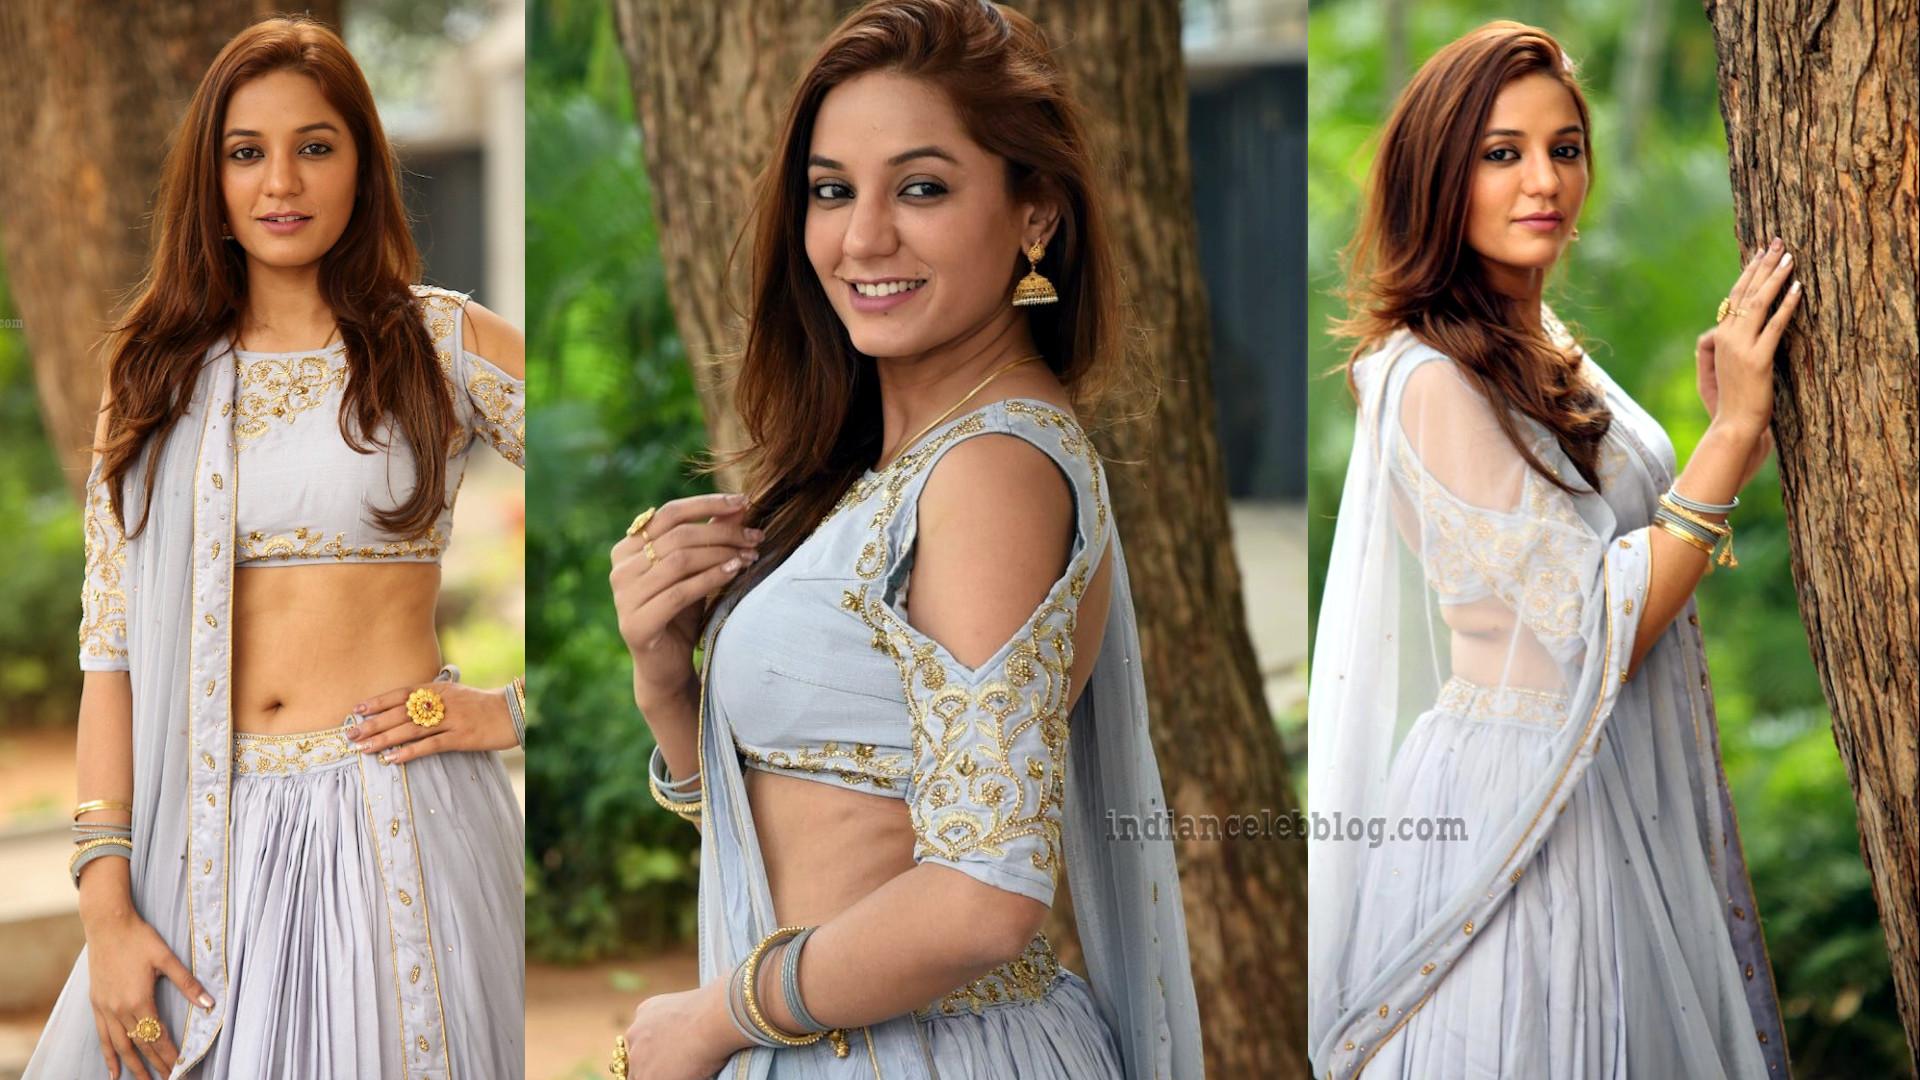 Niva sharma telugu actress hot lehenga choli event pics